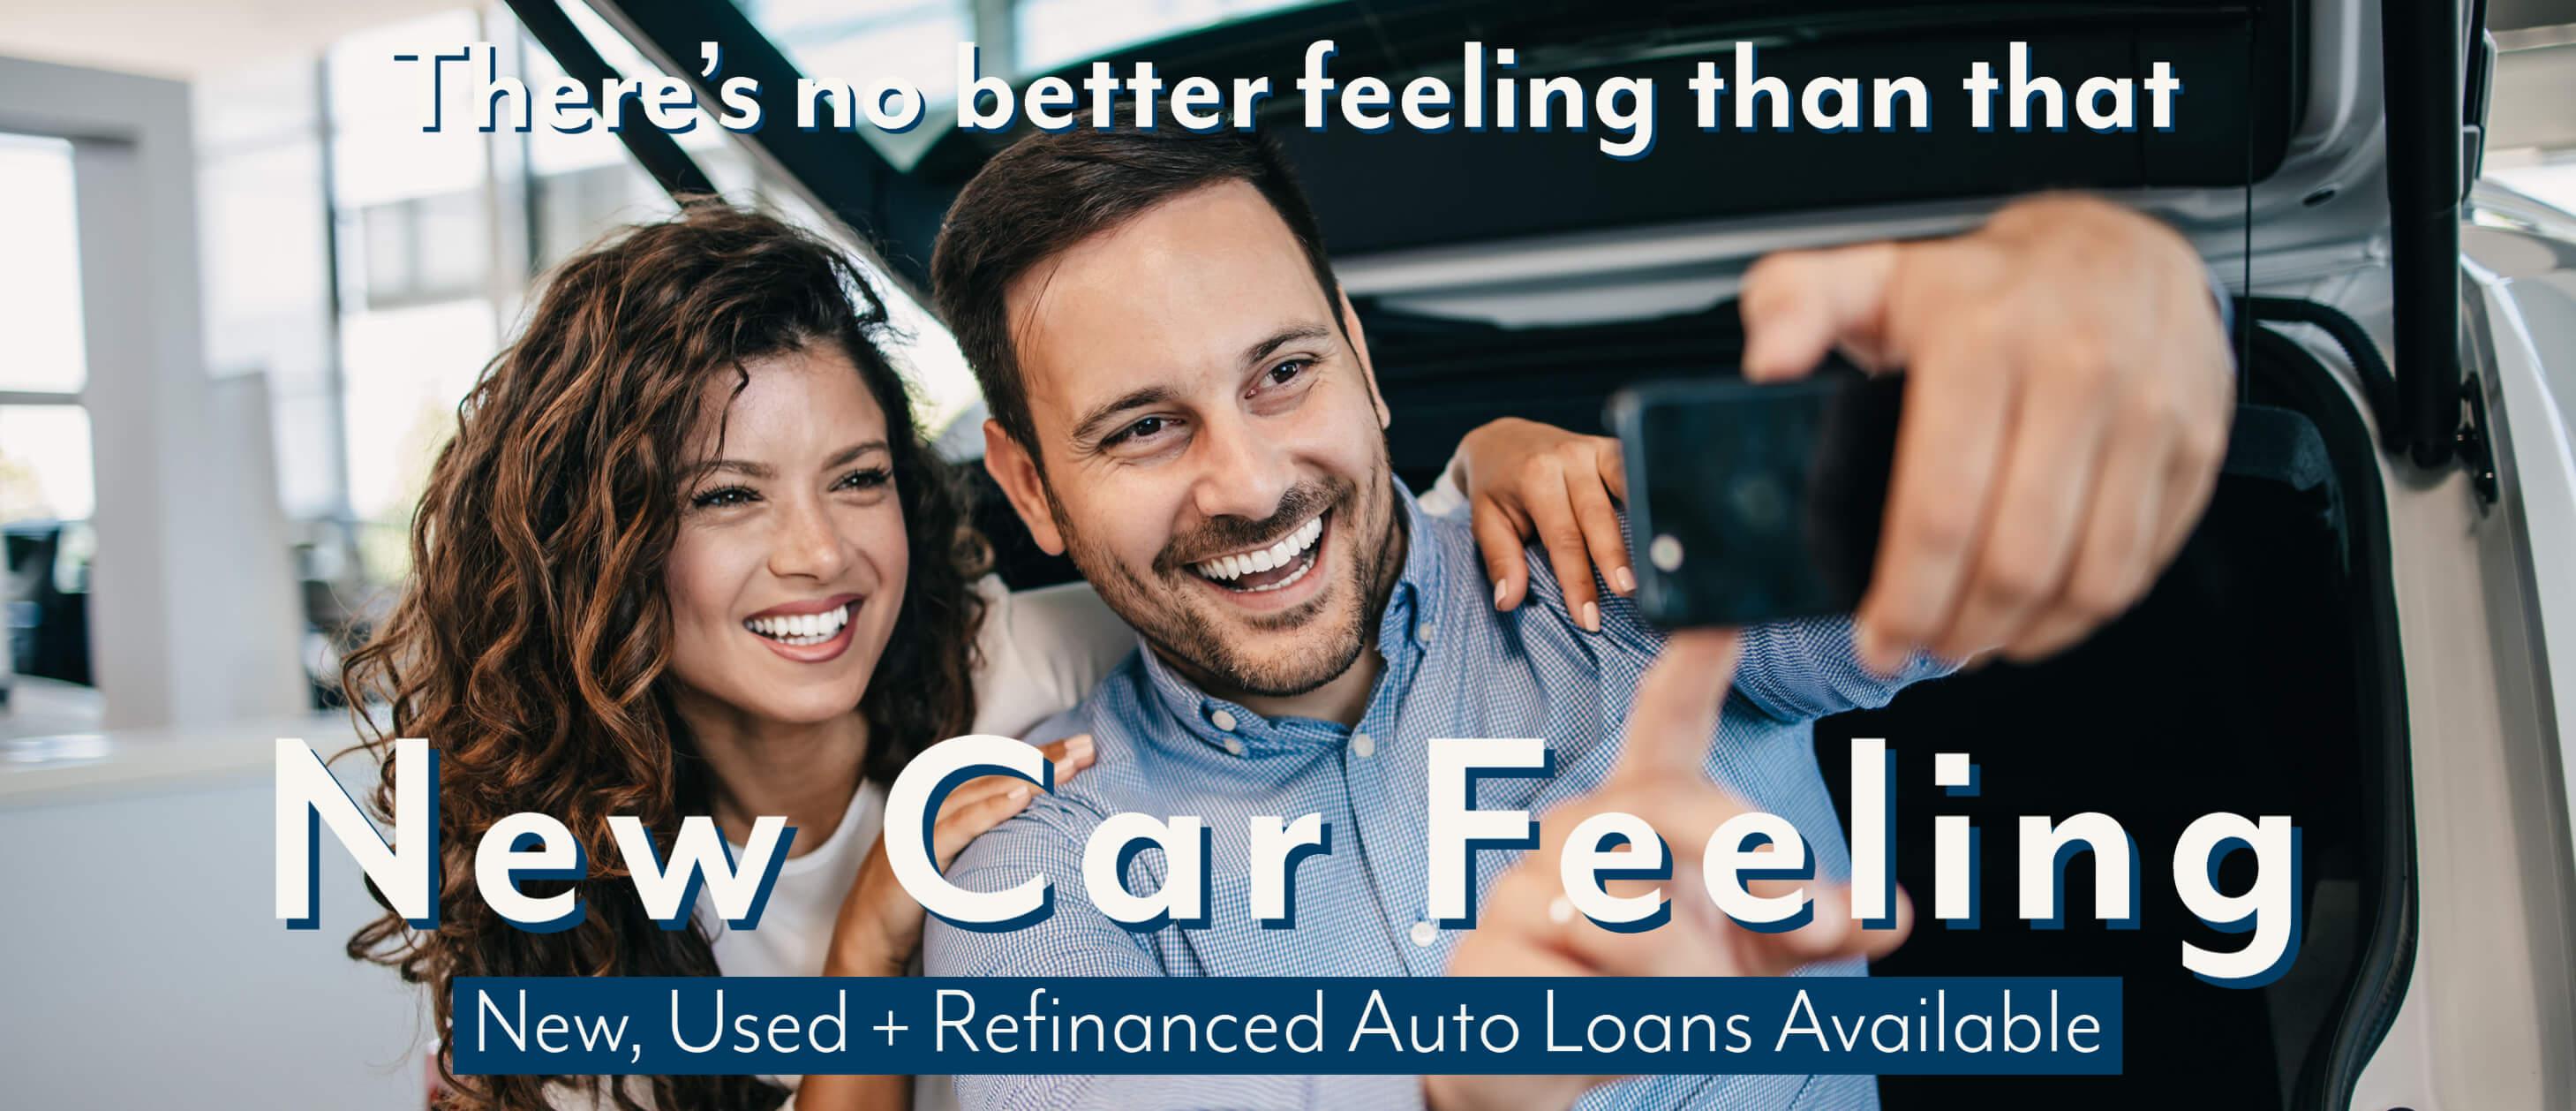 Auto Loans - August